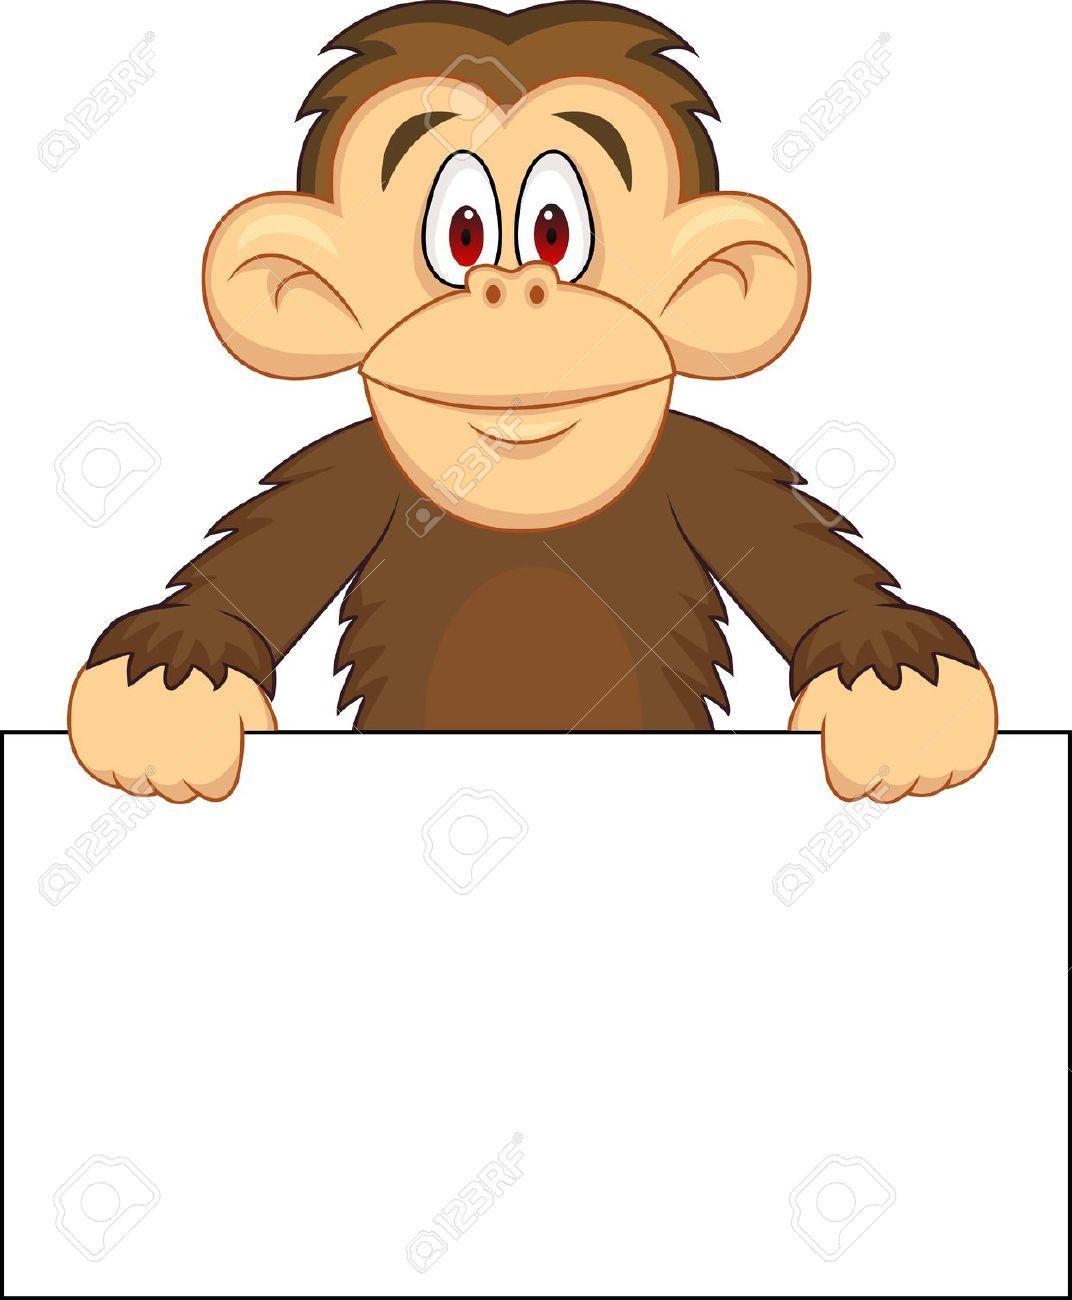 chimpanzee clipart clipart panda free clipart images chimpanzee clip art free Chimpanzee Clip Art Black and White